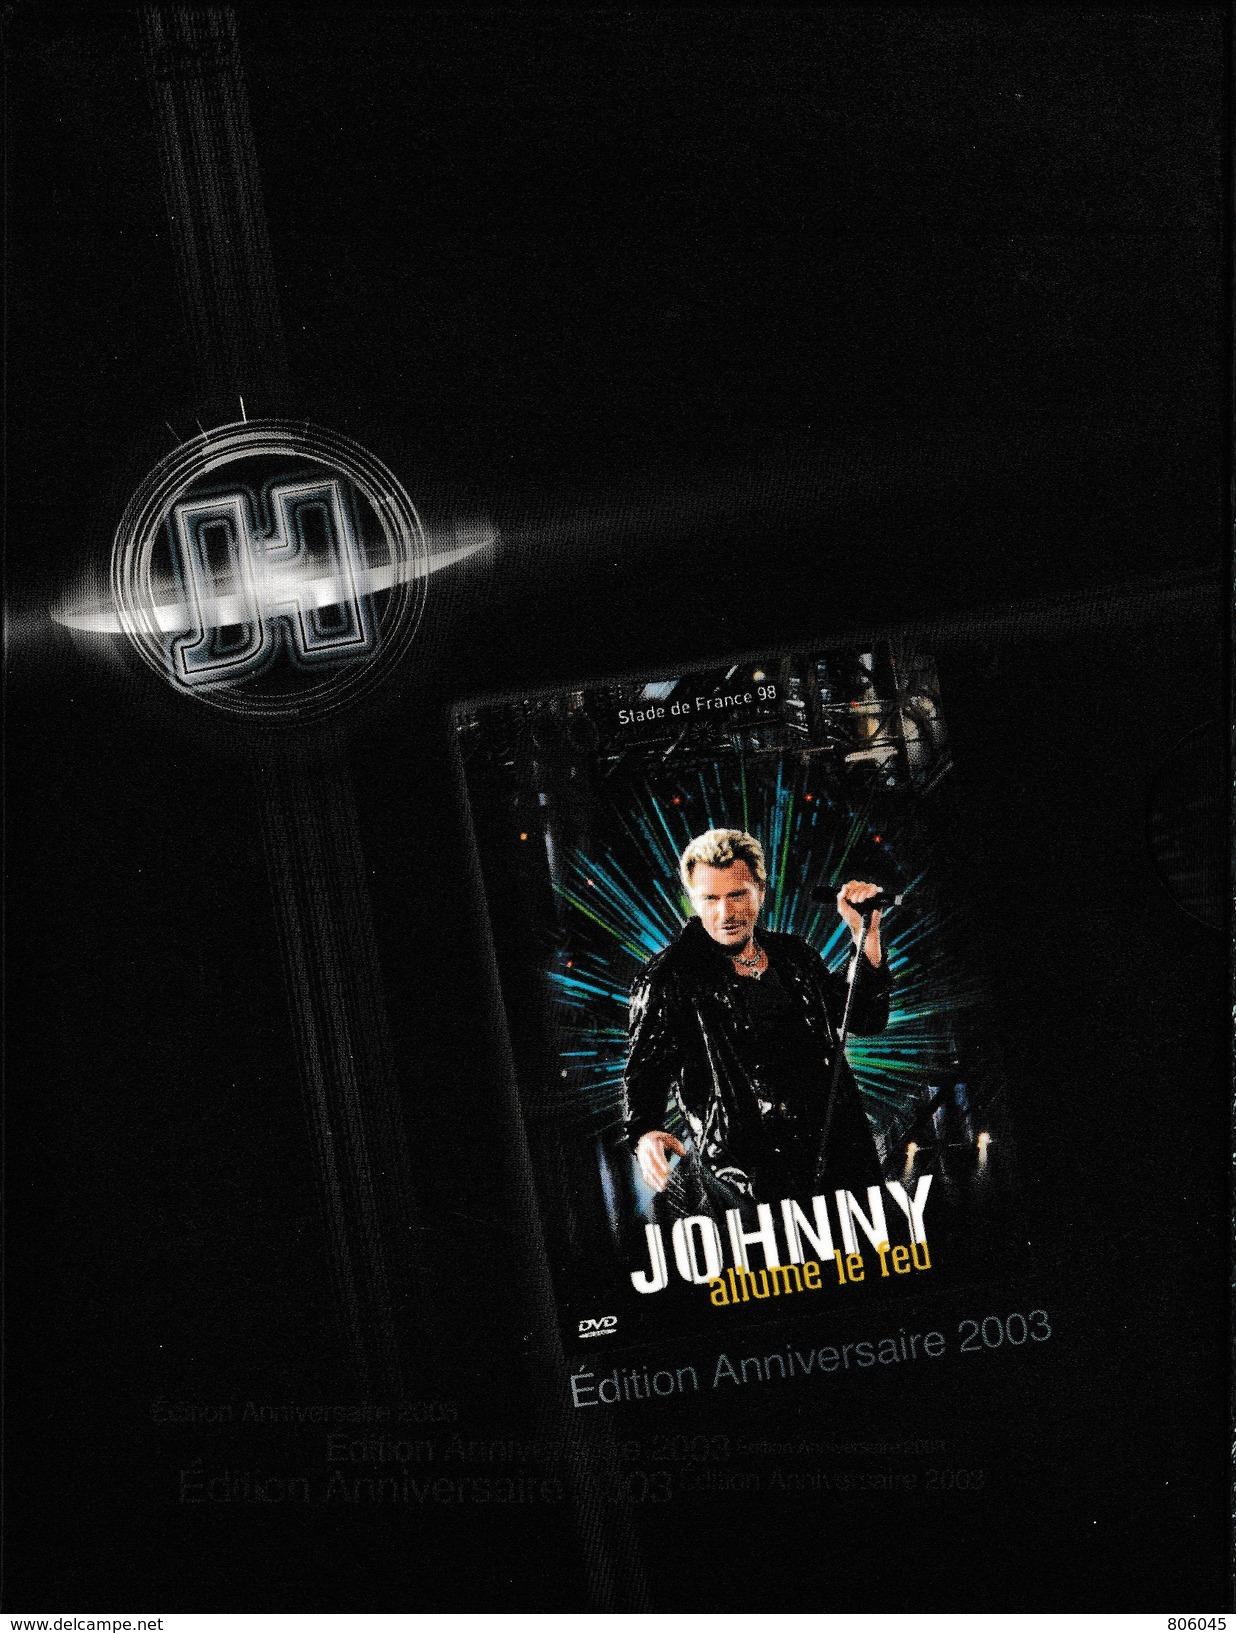 Johnny Hallyday Allume Le Feu - Musik-DVD's